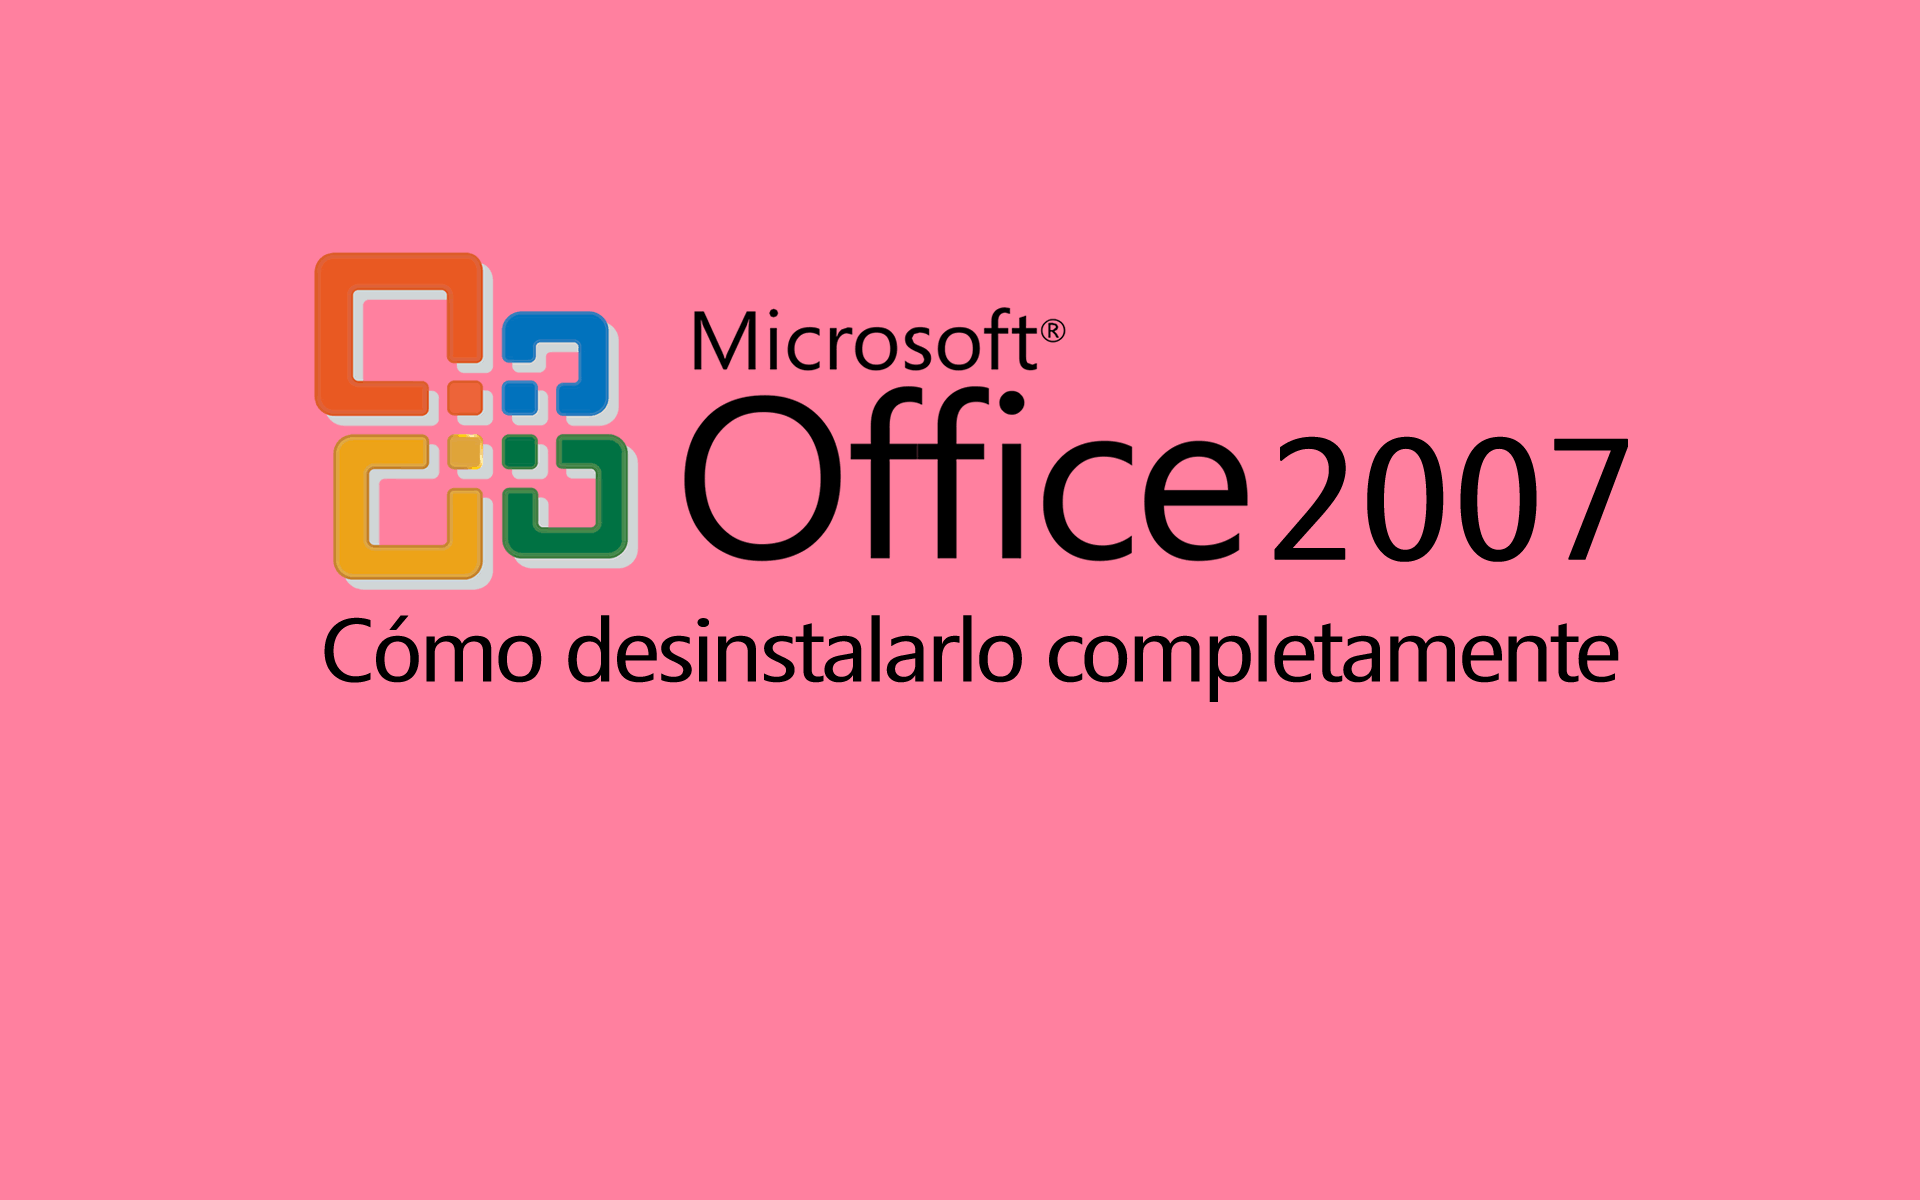 Entérese como Desinstalar Office 2007, sin complicacioens